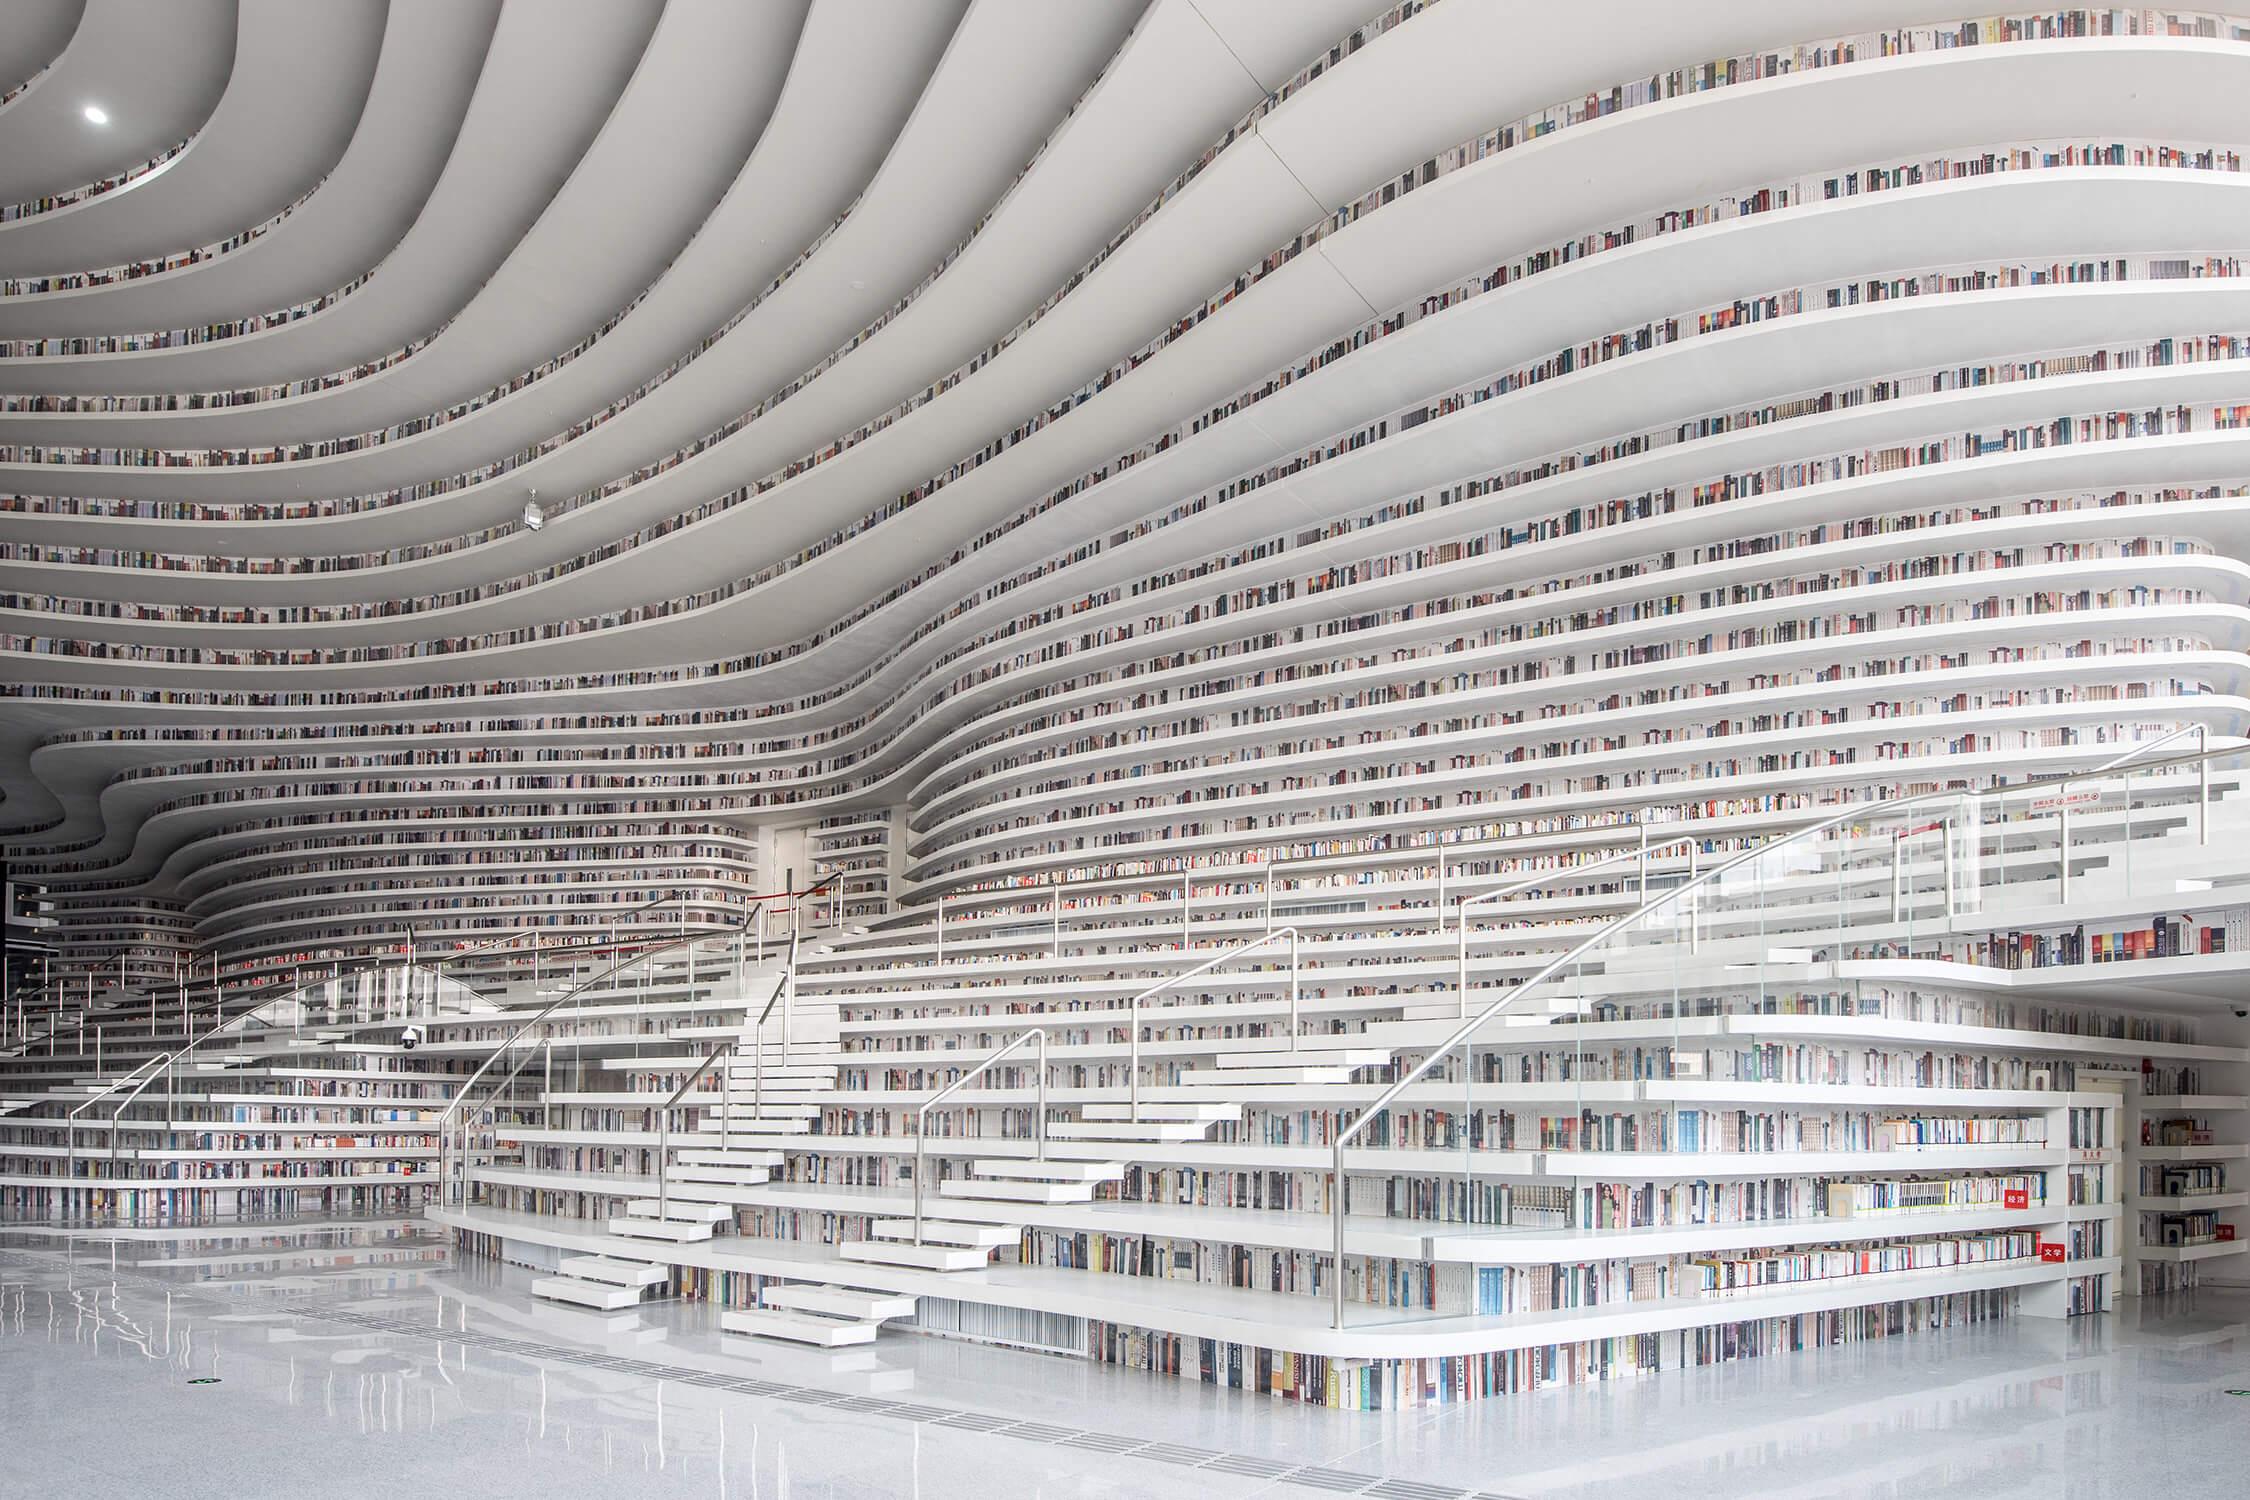 How MVRDV's Winy Maas Designed the Tianjin Binhai Library   Azure